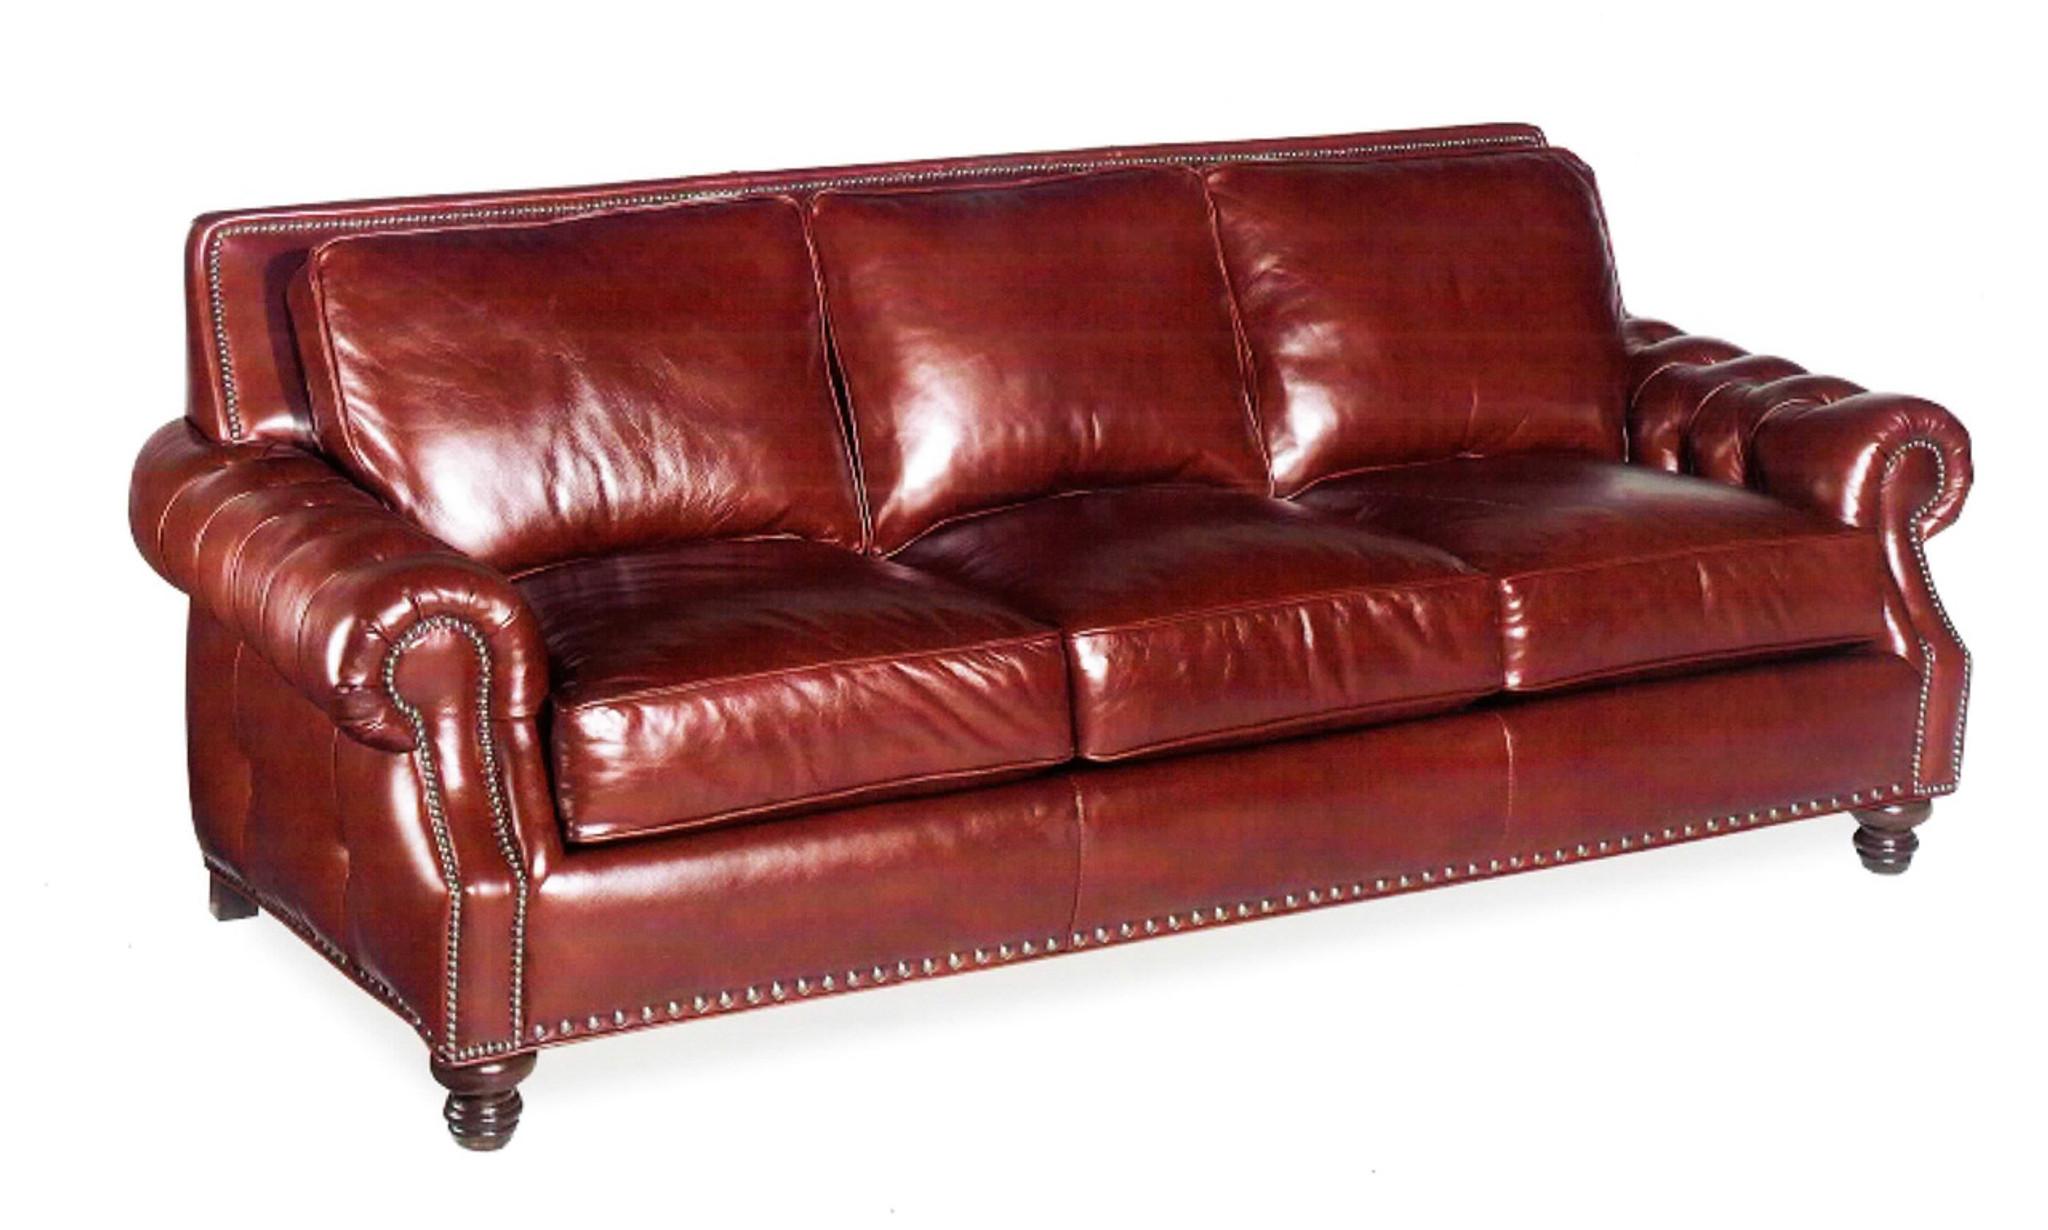 Etonnant American Heritage London Sofa ...